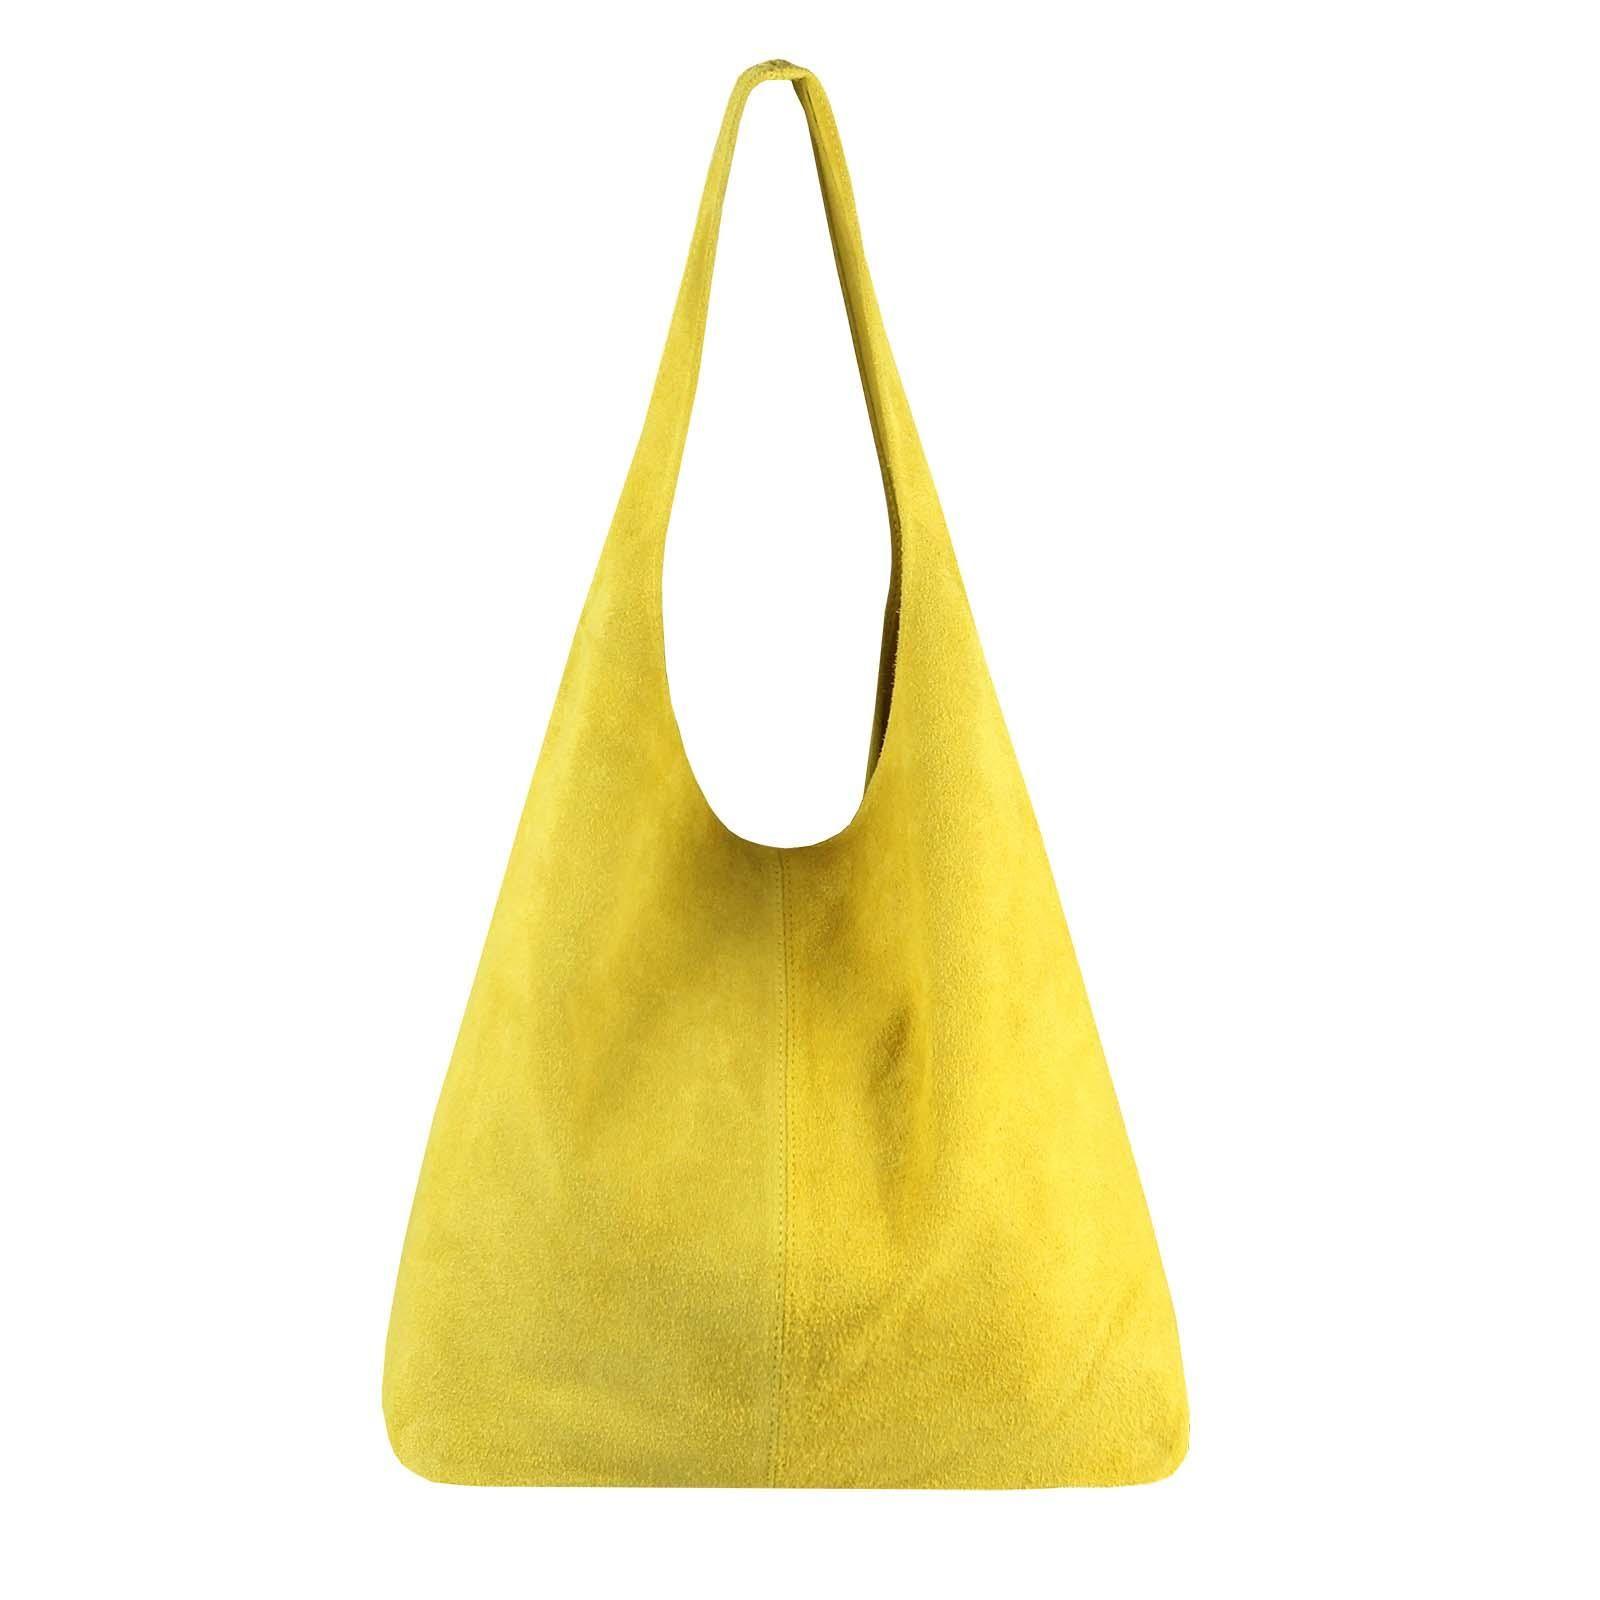 66fa9d5d6c03d MADE IN ITALY DAMEN LEDER TASCHE Handtasche Wildleder Shopper Schultertasche  Hobo-Bag Henkeltasche Beuteltasche Velourleder